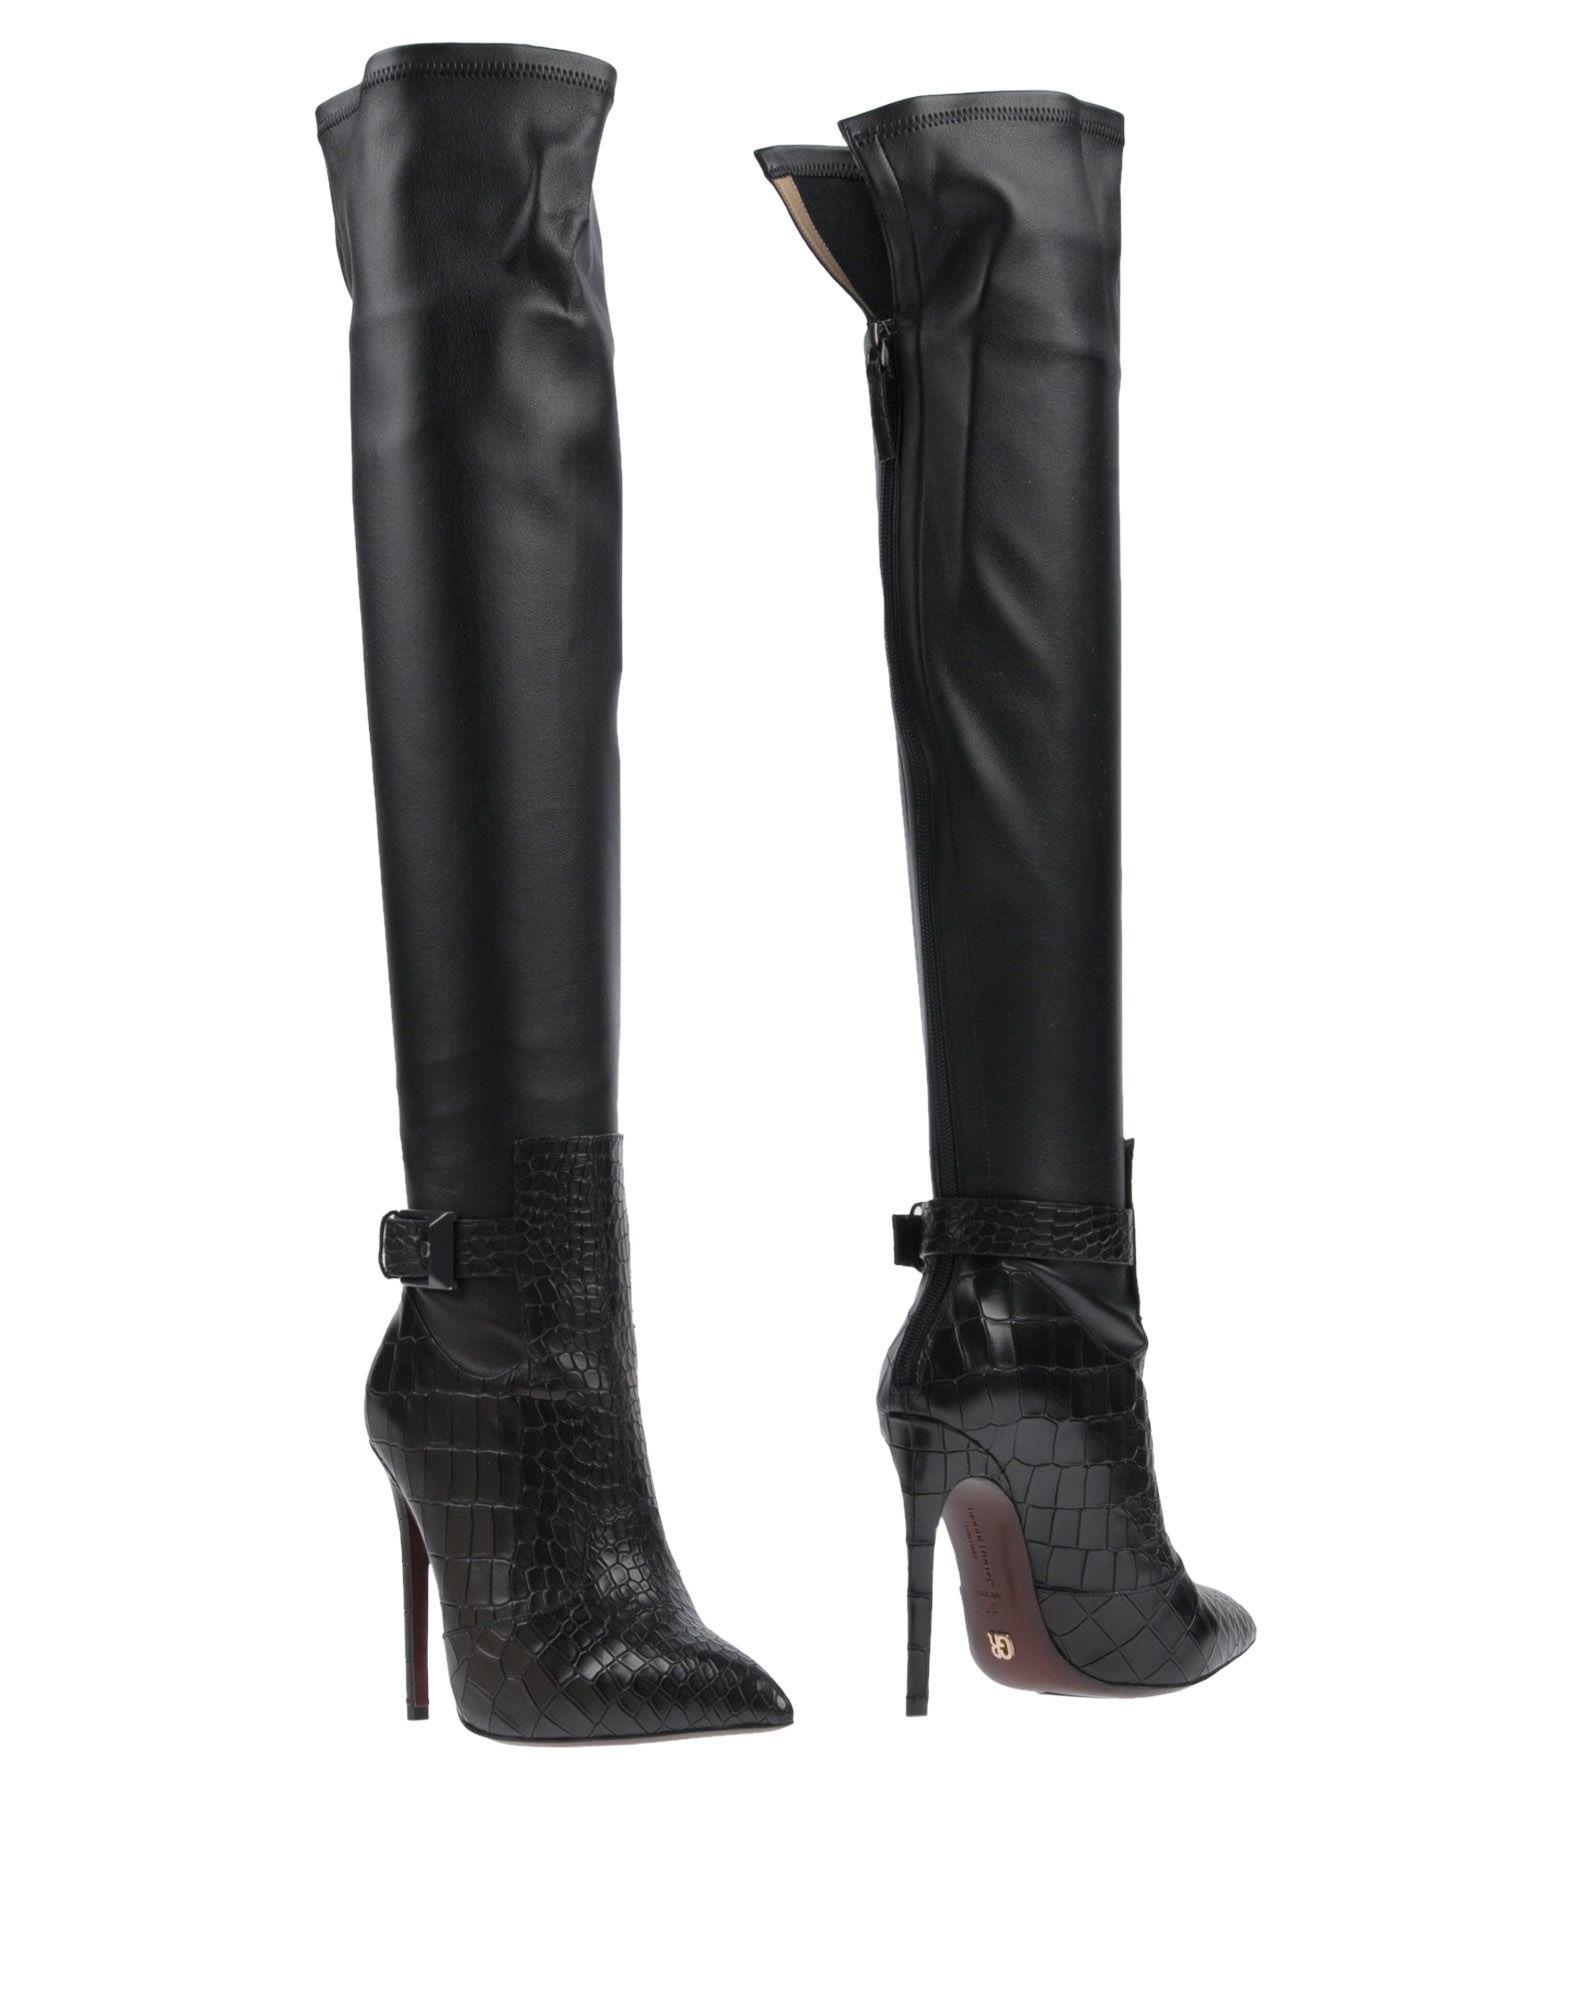 Gianni Renzi®  Couture Boots - Women Boots Gianni Renzi®  Couture Boots Women online on  Australia - 11455989DD c280d4